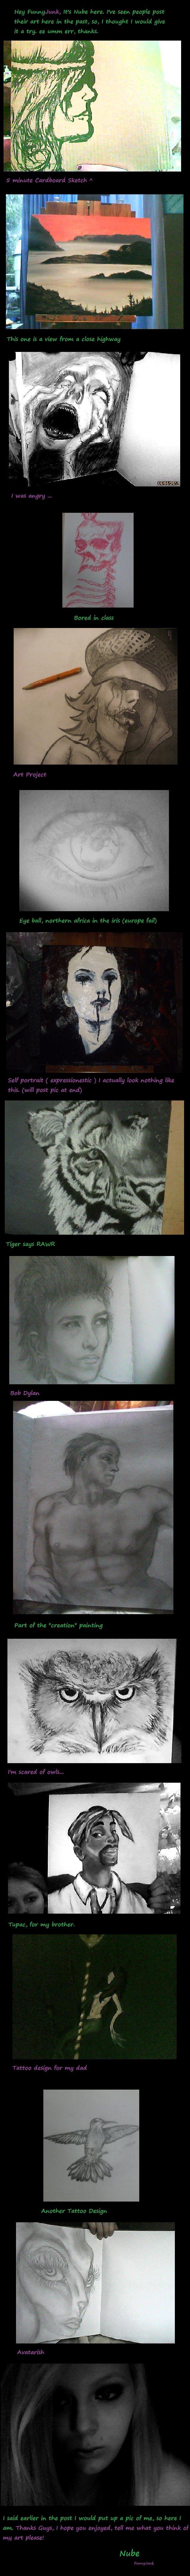 My Art. Art, funfunfun...tell me what you thinkkk, I will take requests!. Art